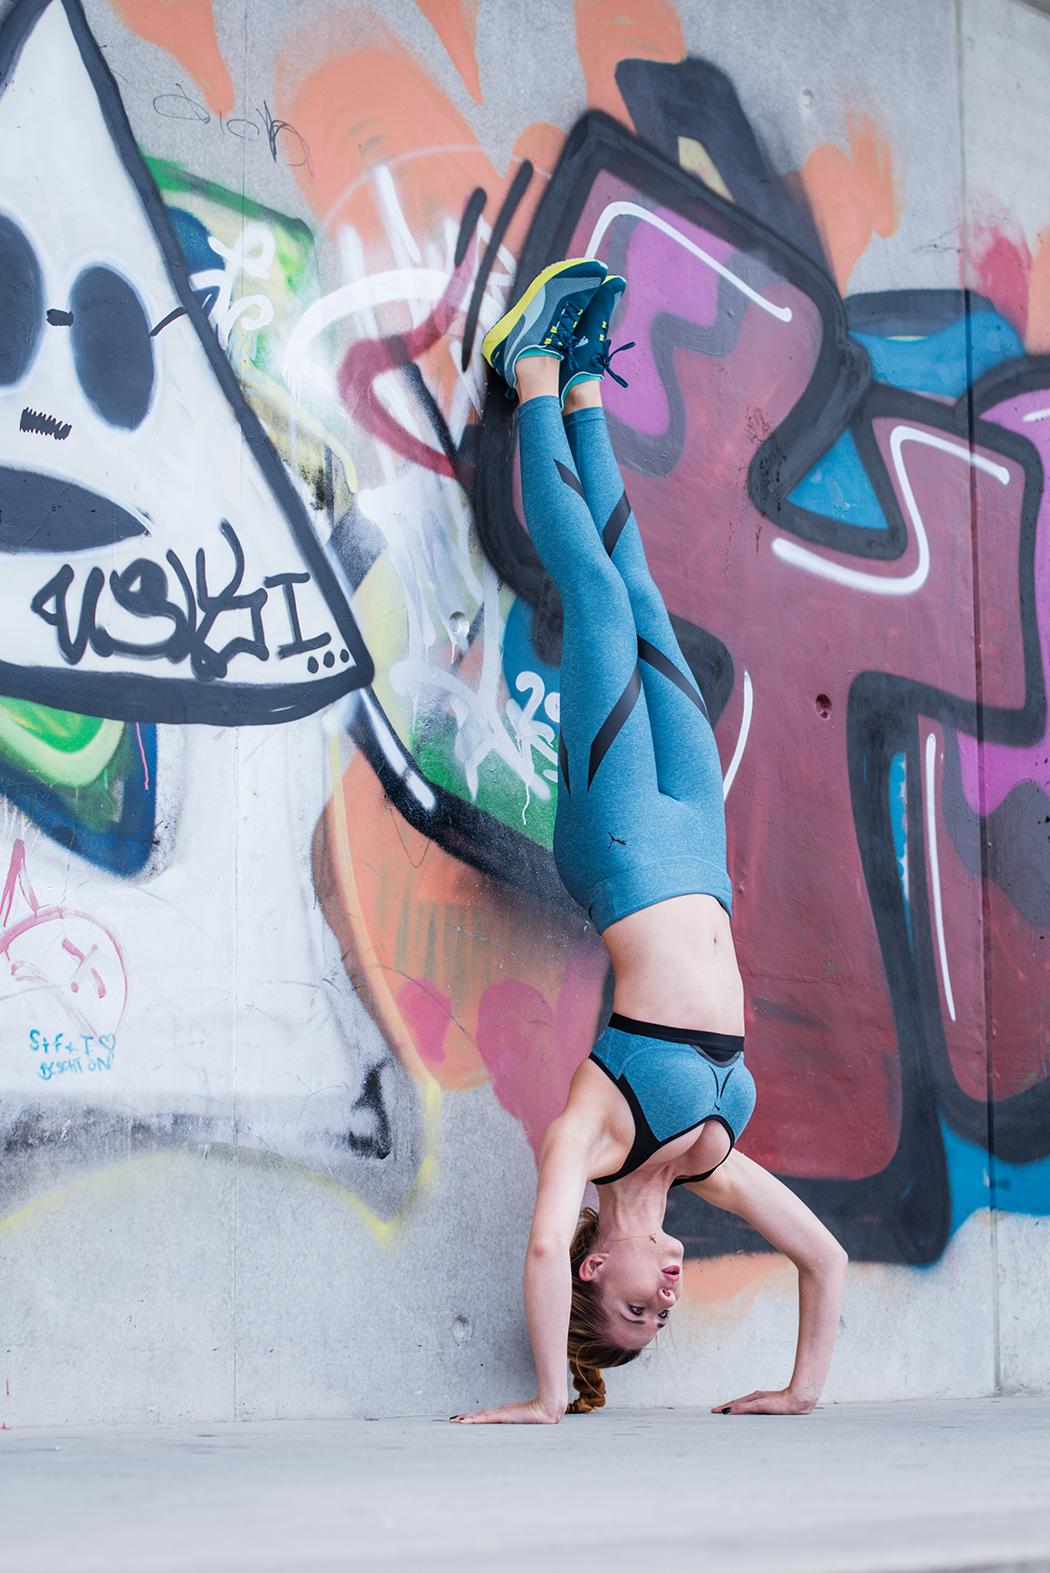 Fitnessblog-Fitnessblogger-Fitness-Blog-Sport-Blogger-Lifestyle-Puma-Ignite-Rihanna-Lindarella-Linda-Rella-München-Deutschland-6-web